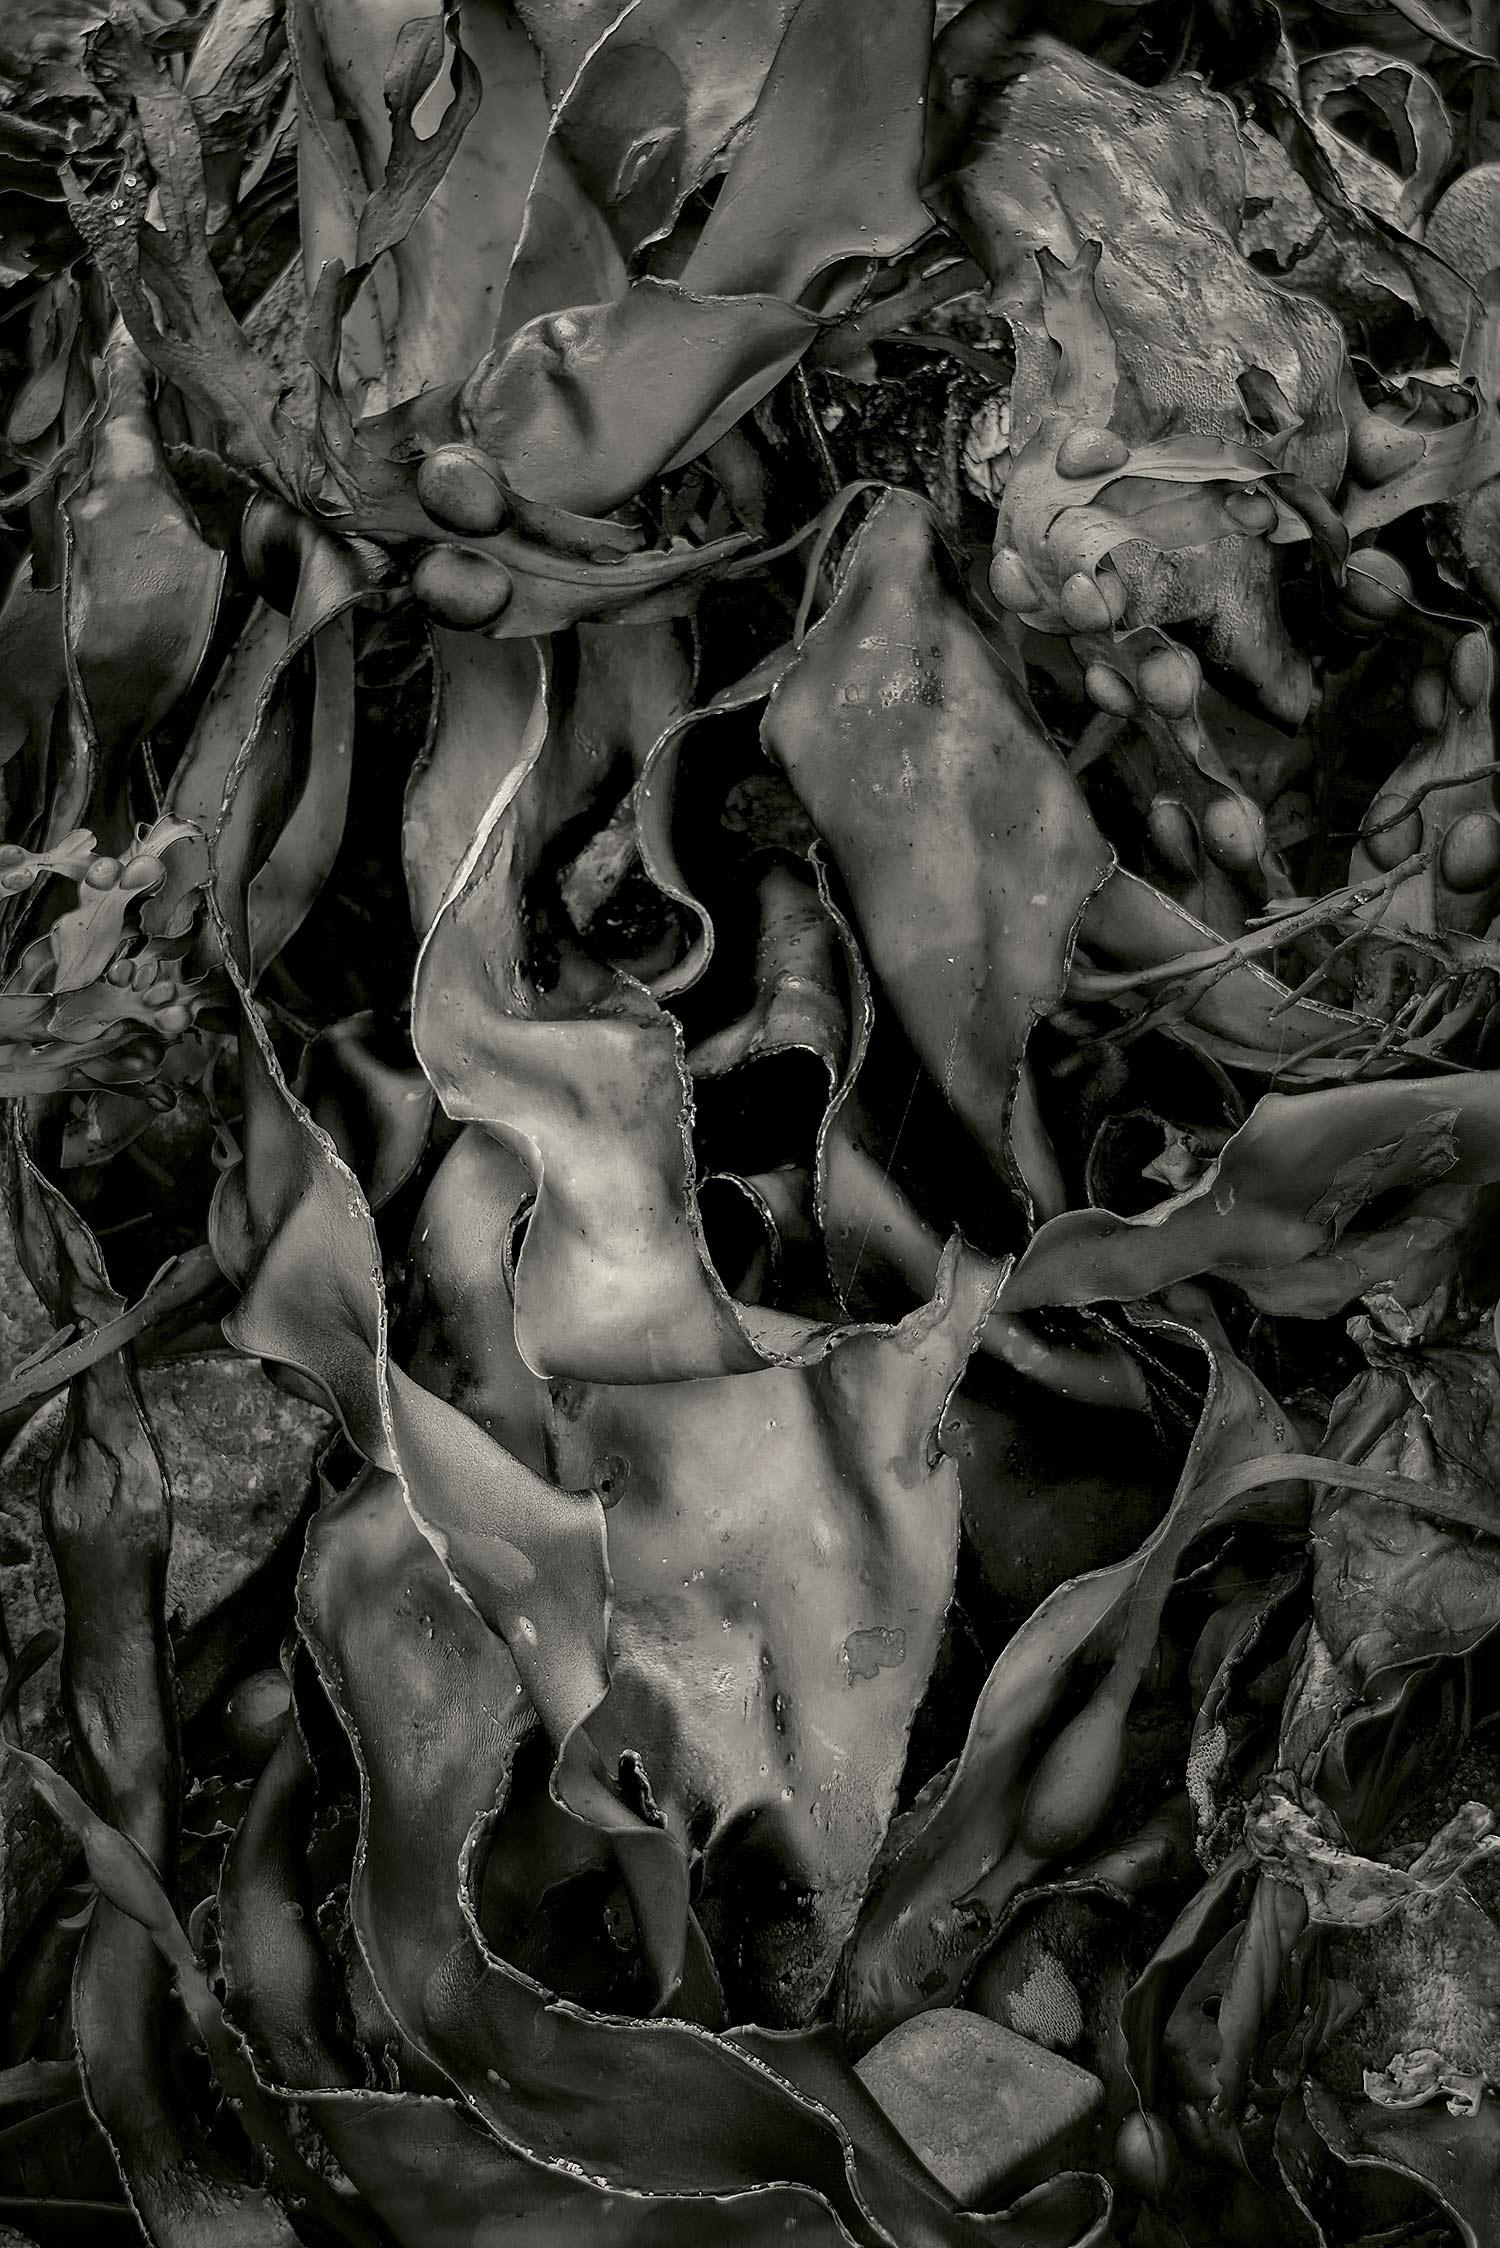 Seaweed 537, Seawall, Maine, 2012